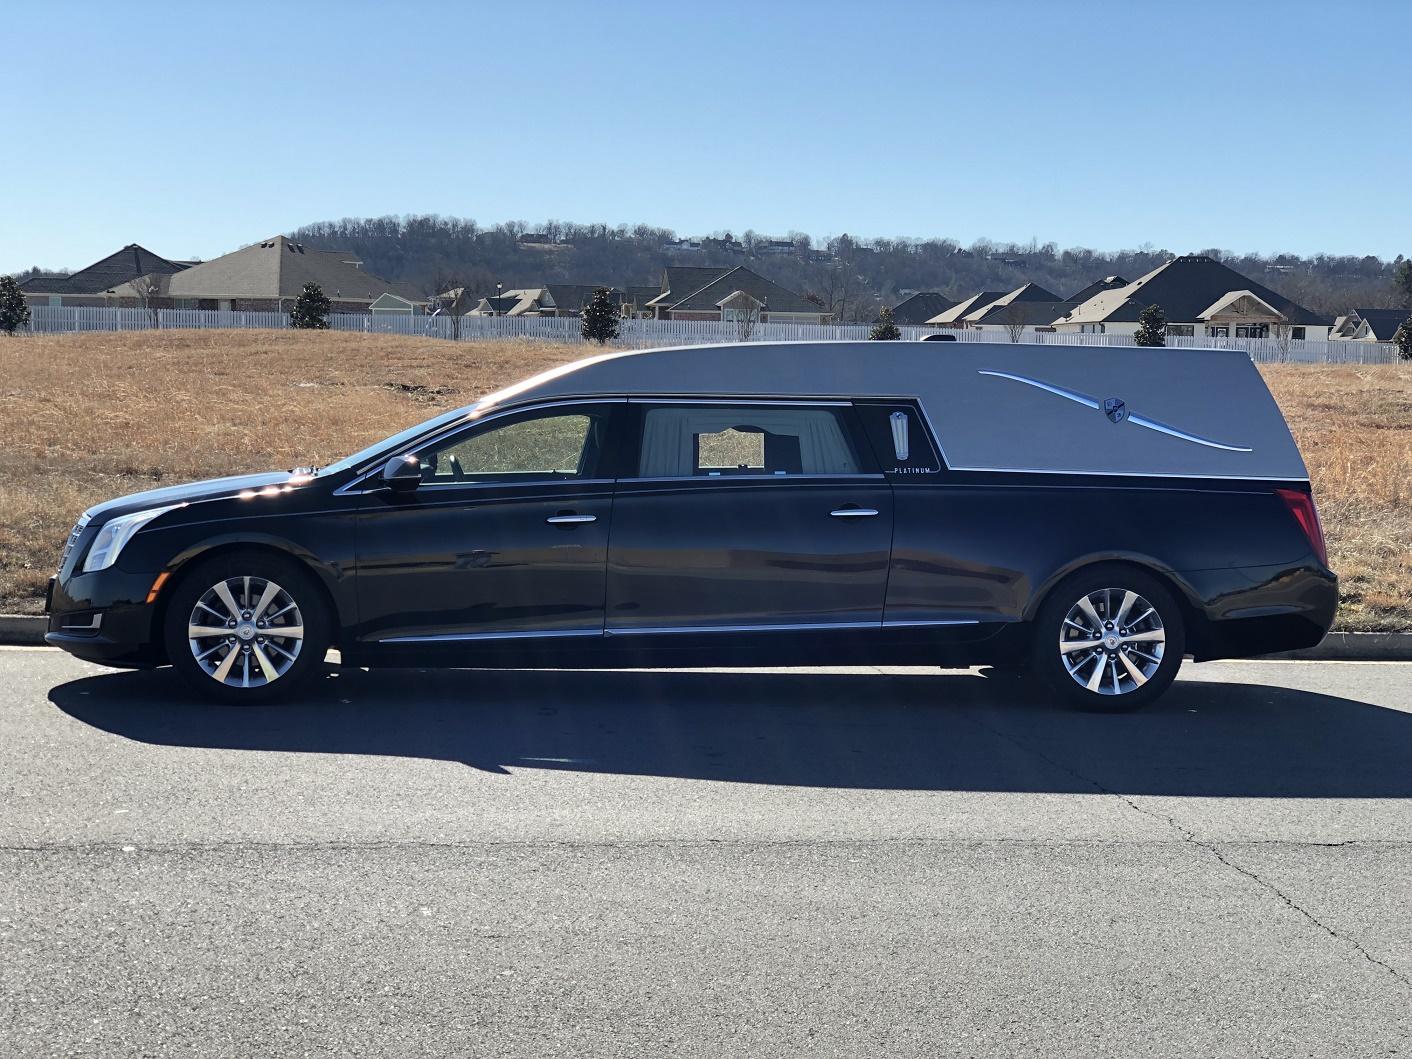 2015 Silver Black Cadillac Platinum Funeral Hearse 1